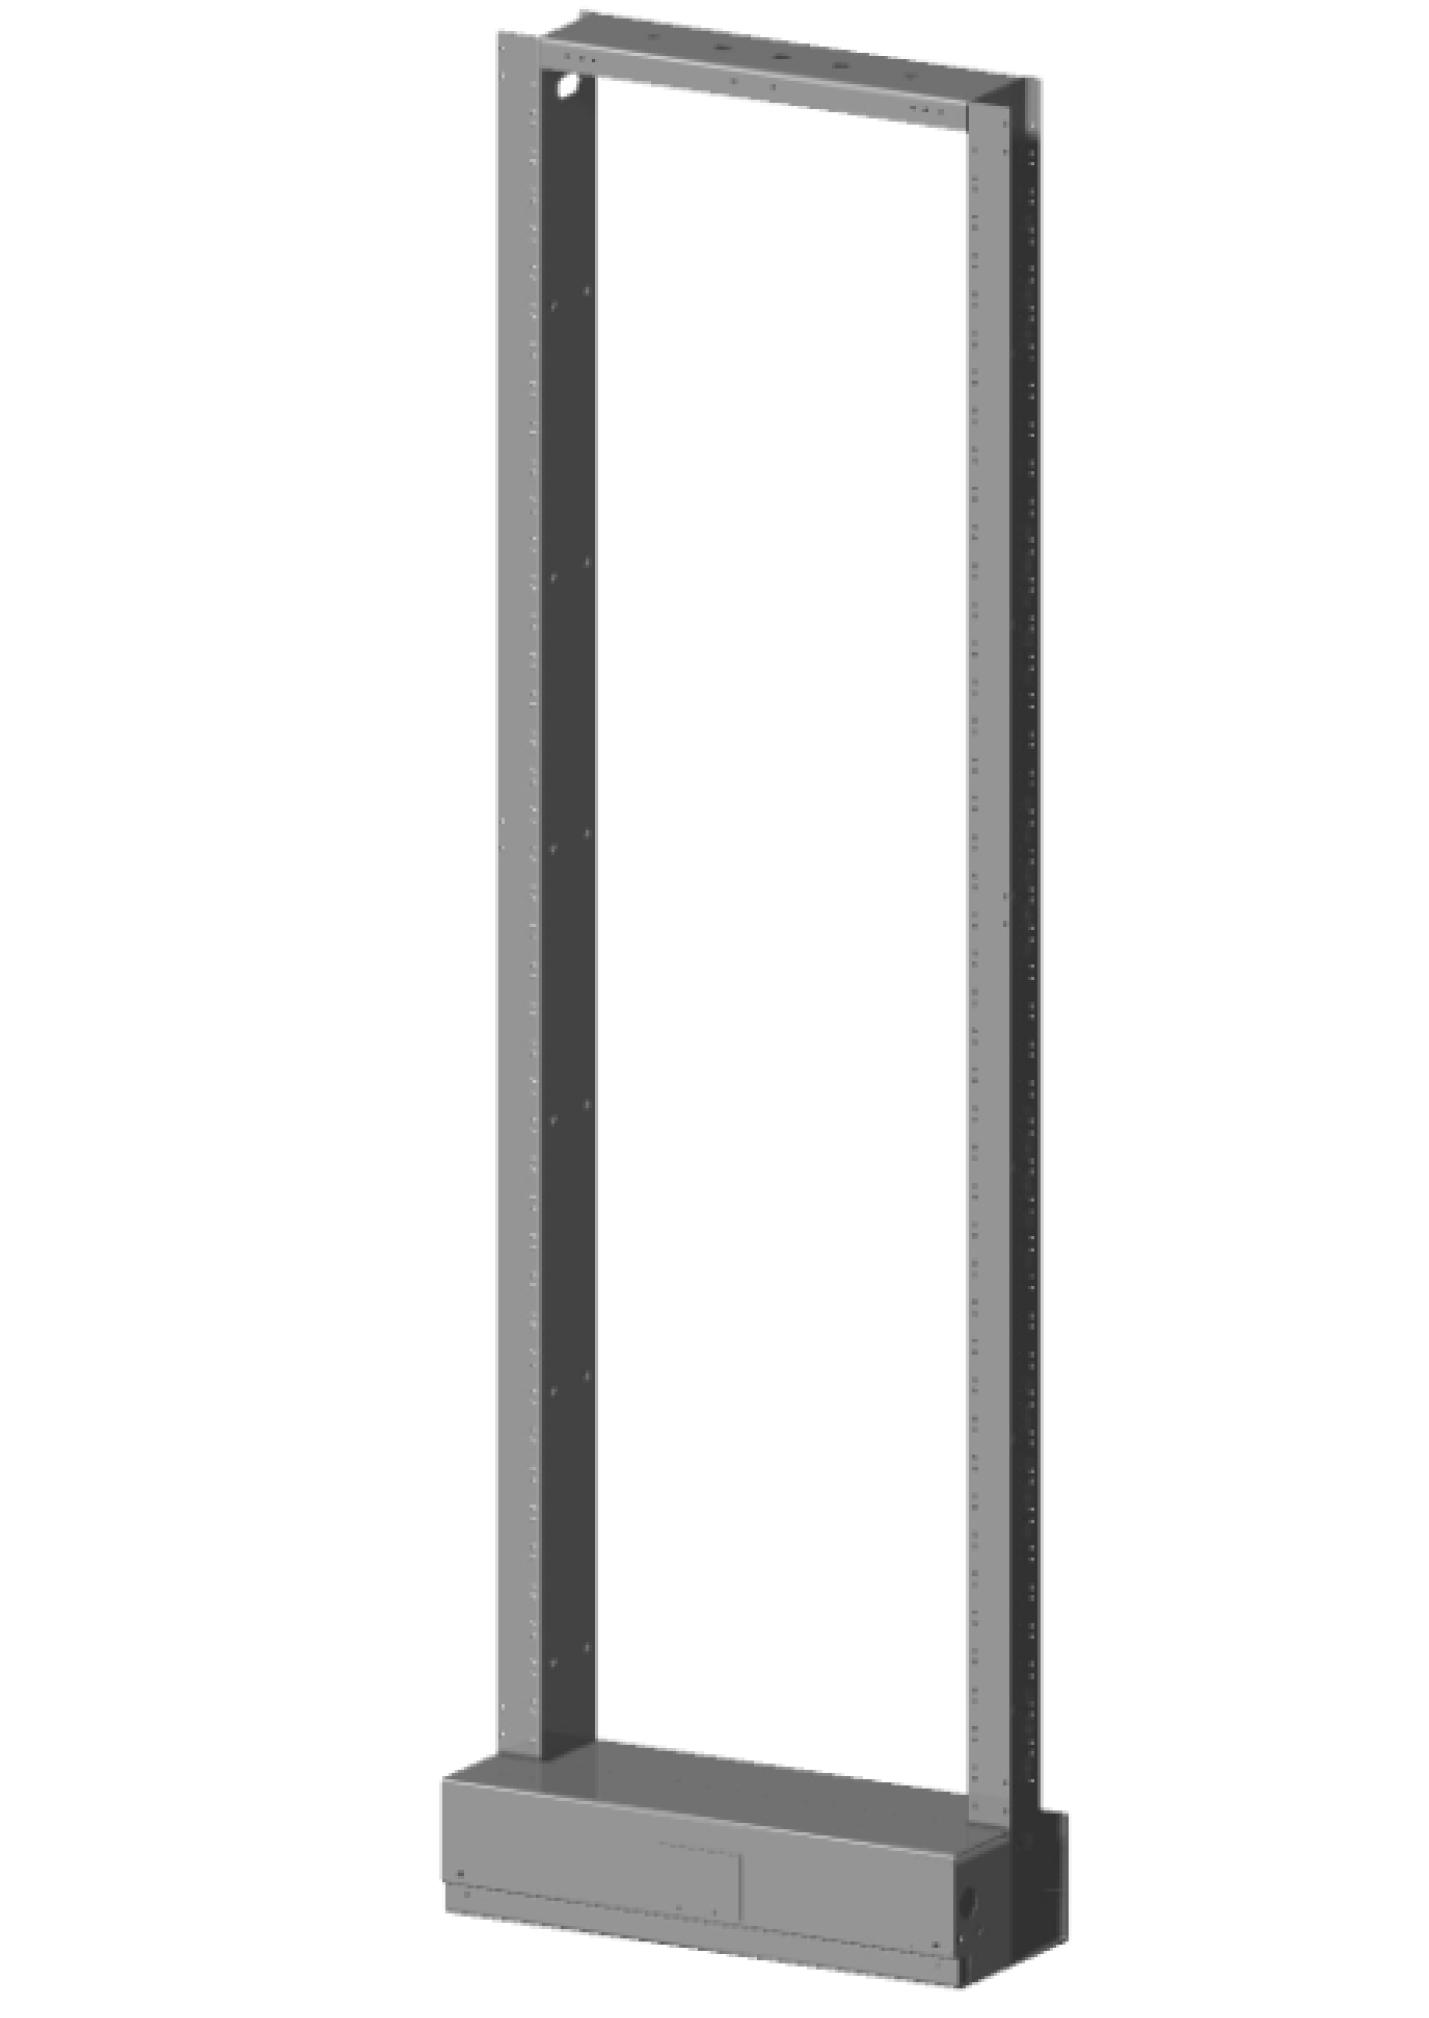 Section E - UEF Bays